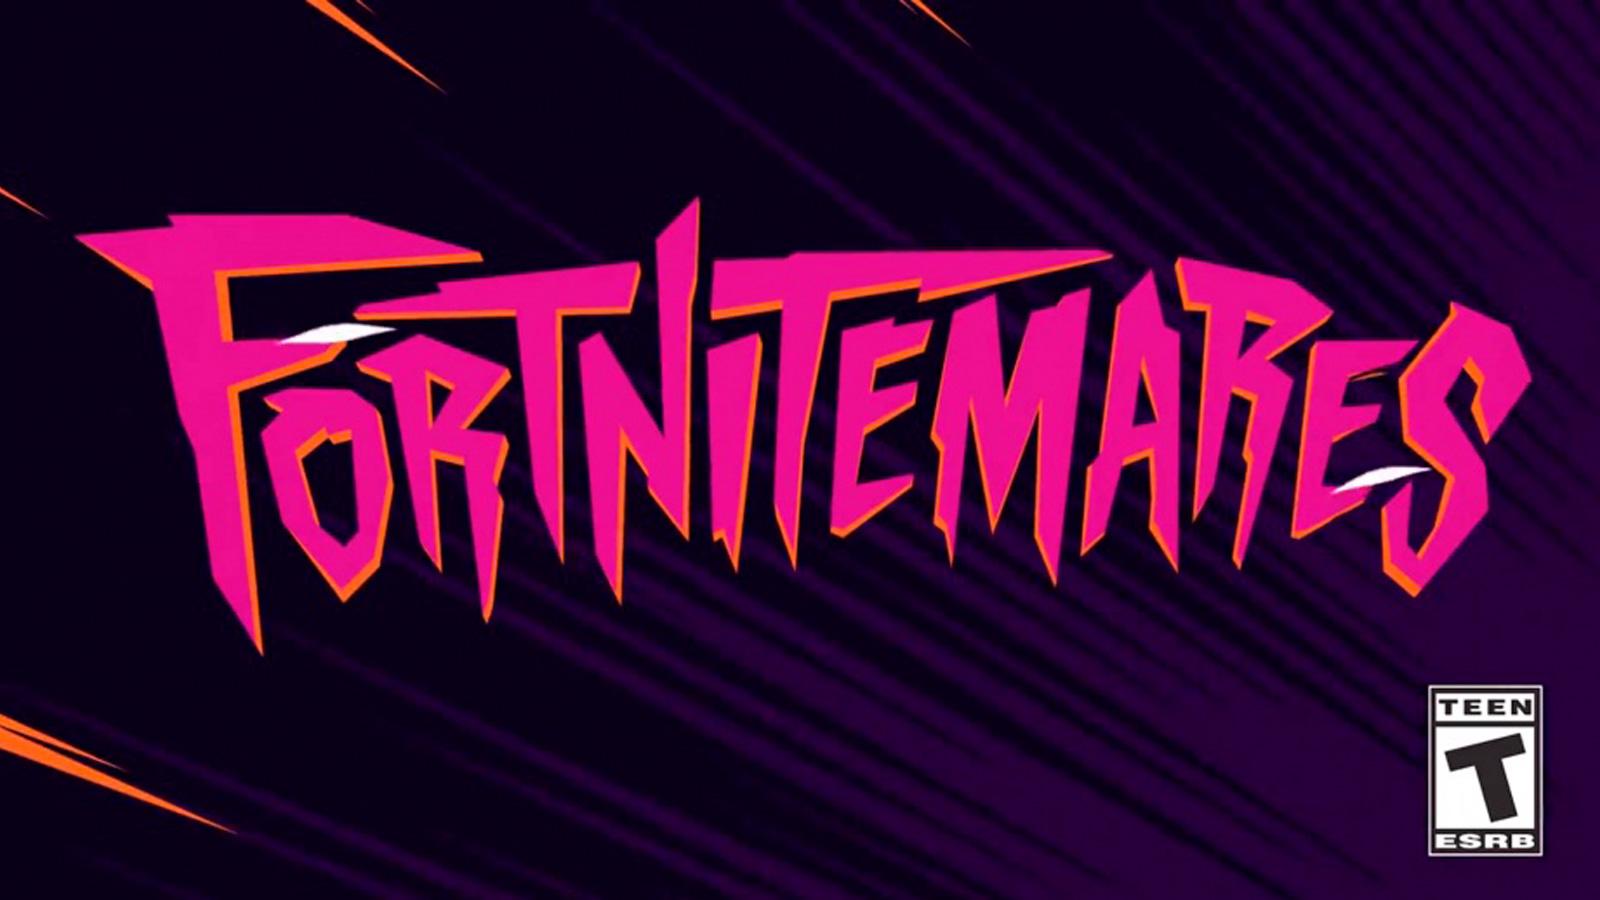 Logo Fortnitemares de Fortnite